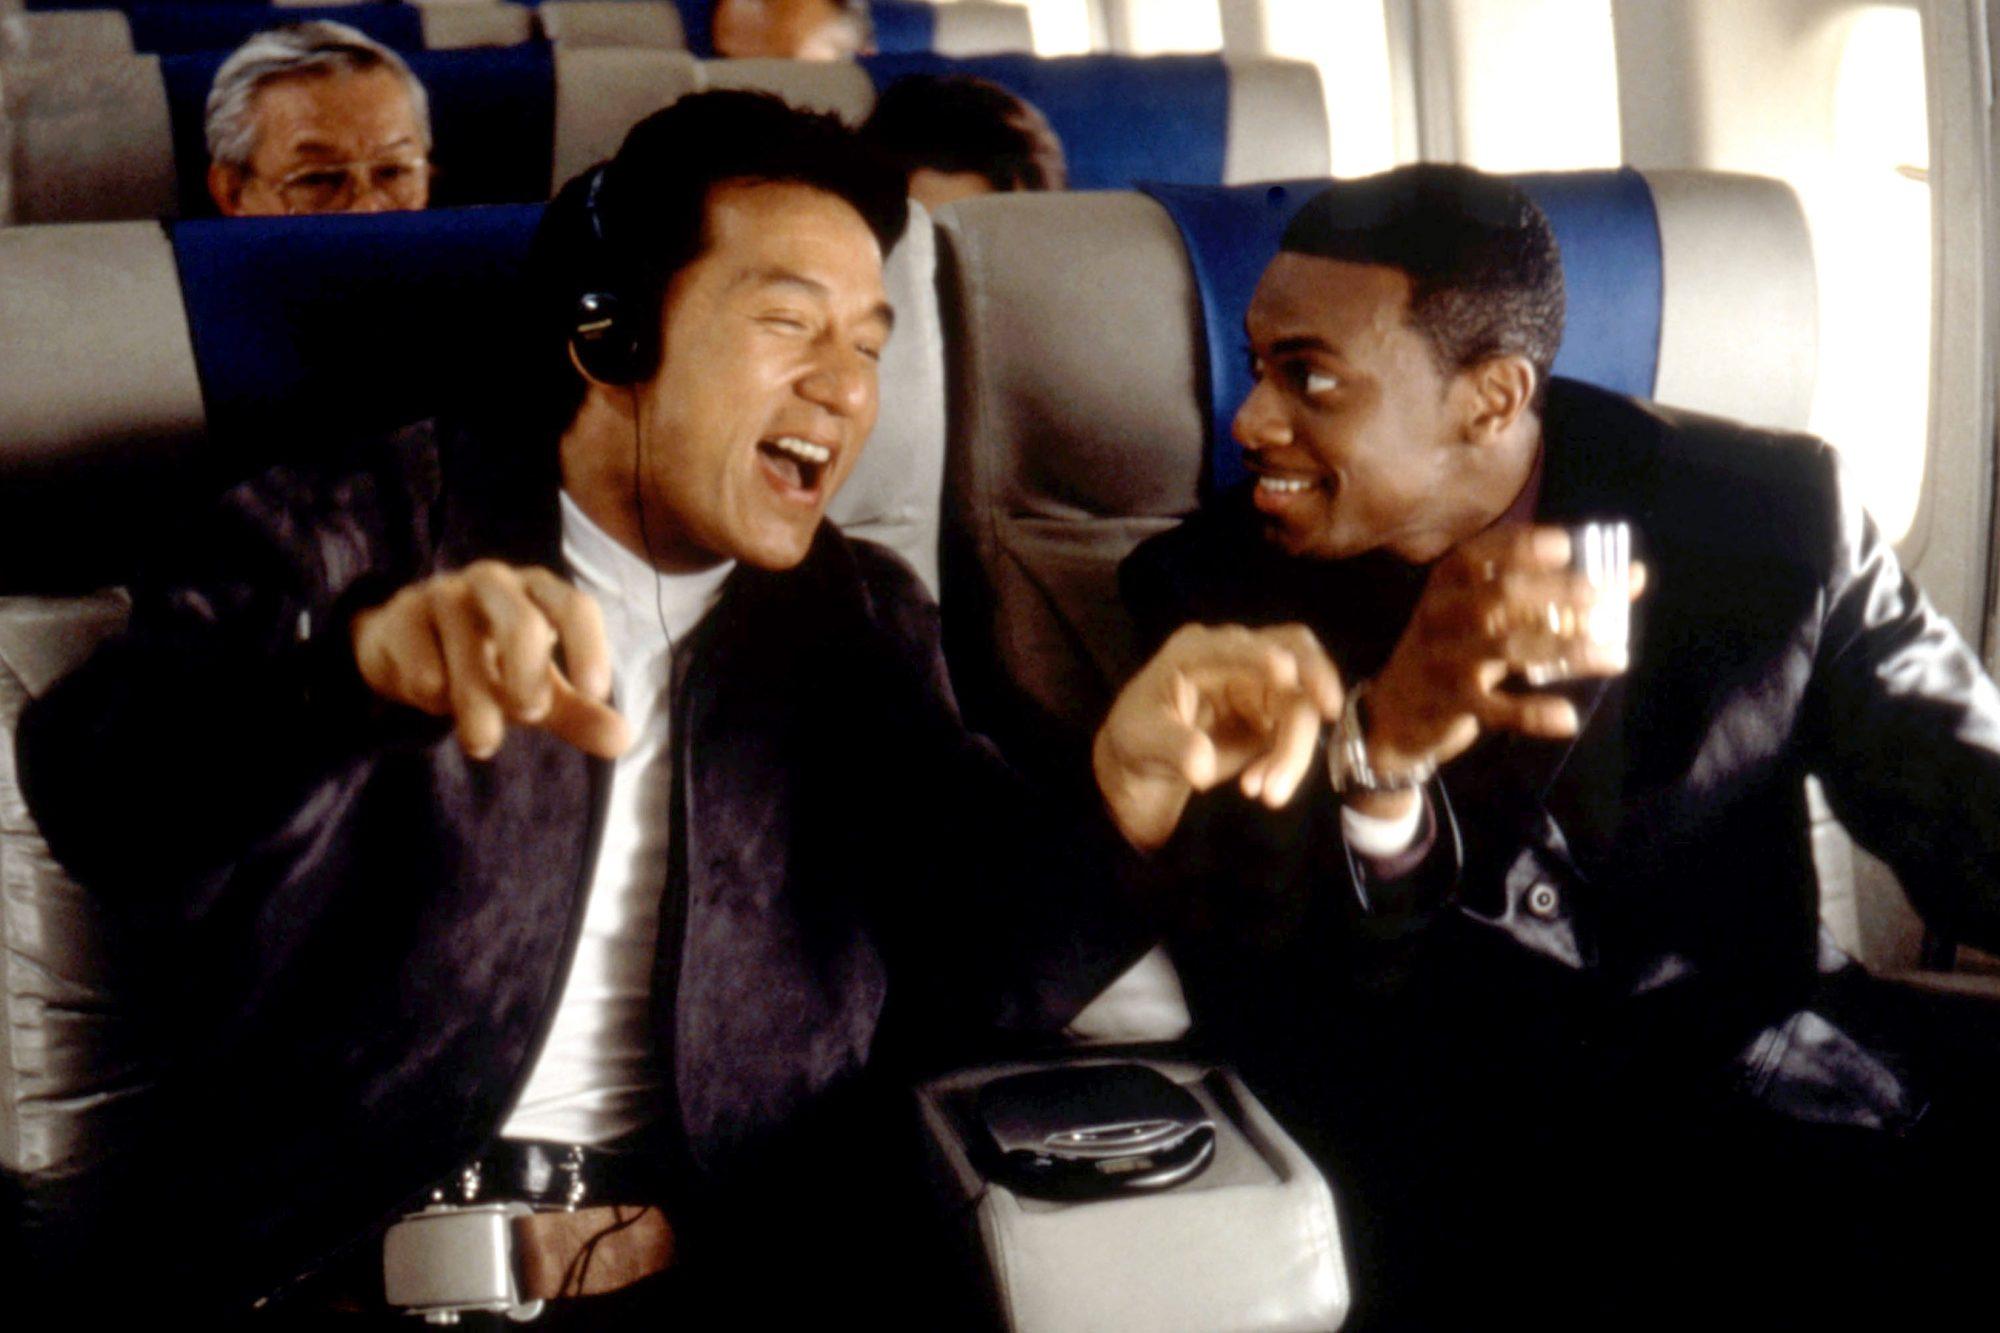 RUSH HOUR, Jackie Chan, Chris Tucker, 1998, (c)New Line Cinema/courtesy Everett Collection